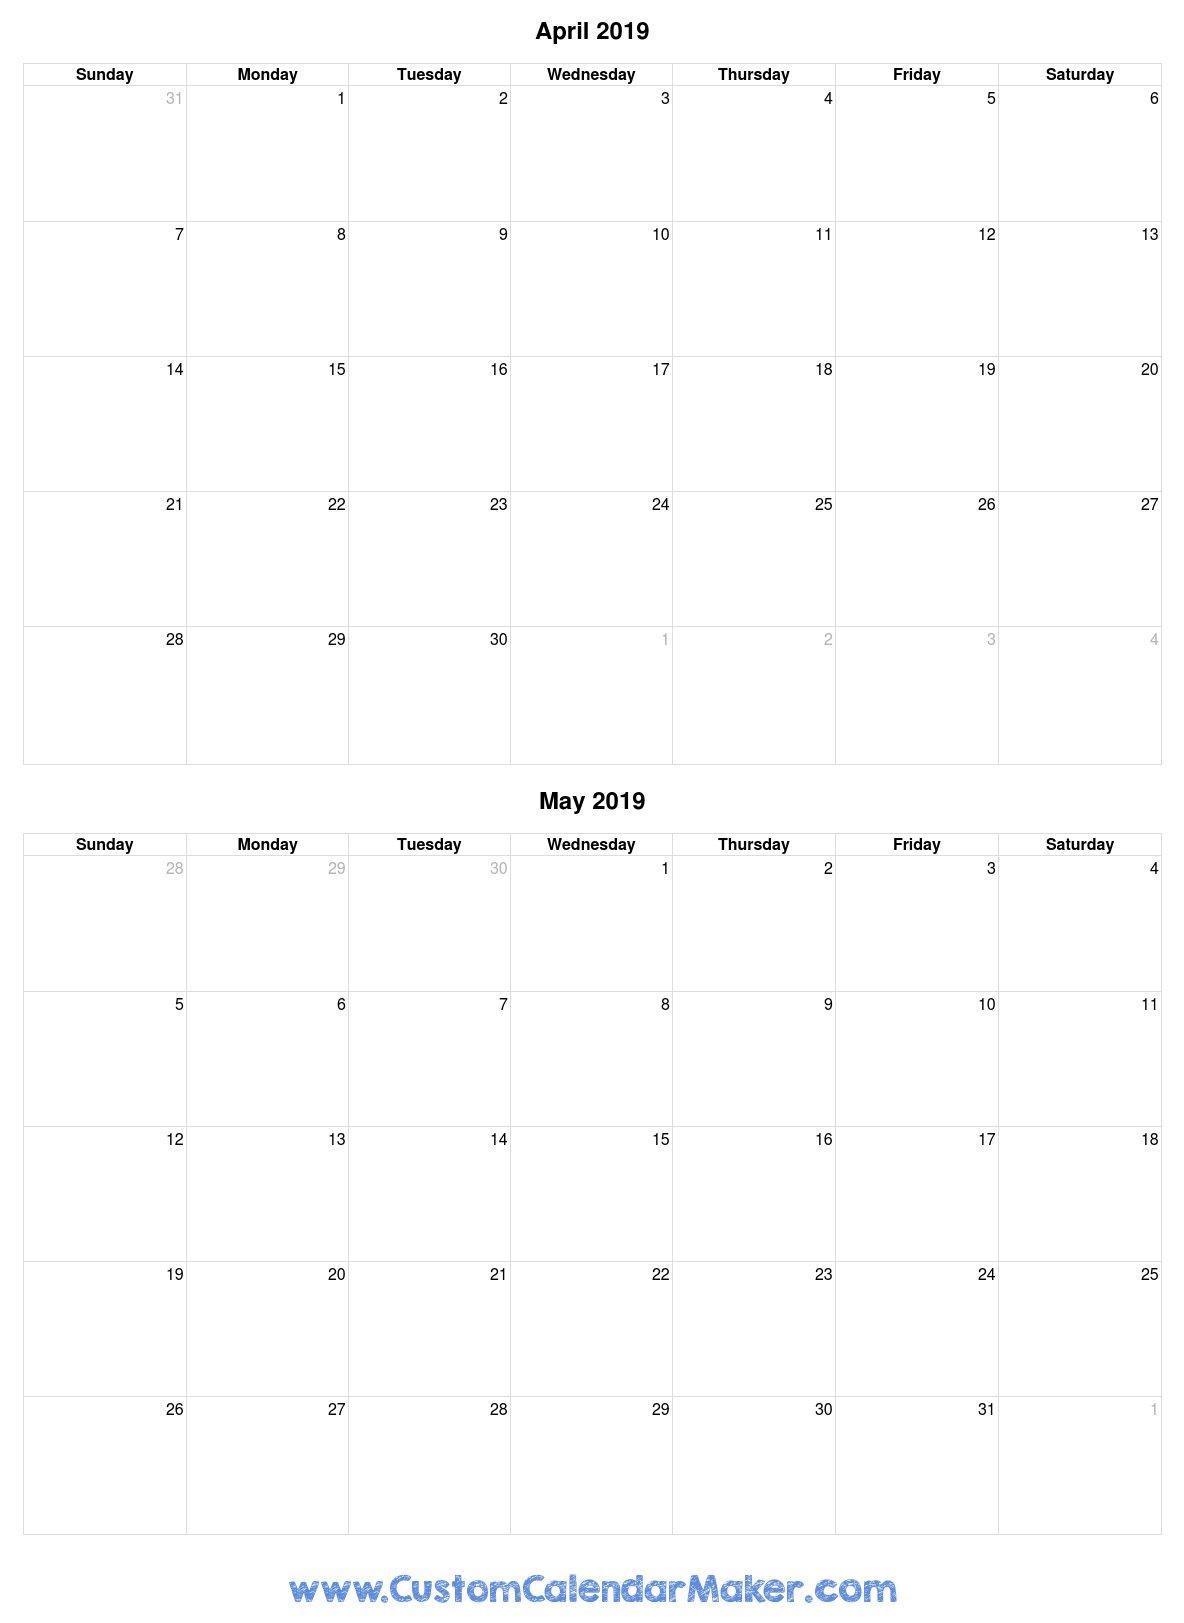 April And May 2019 Free Printable Calendar Template Calendar 2019 April May